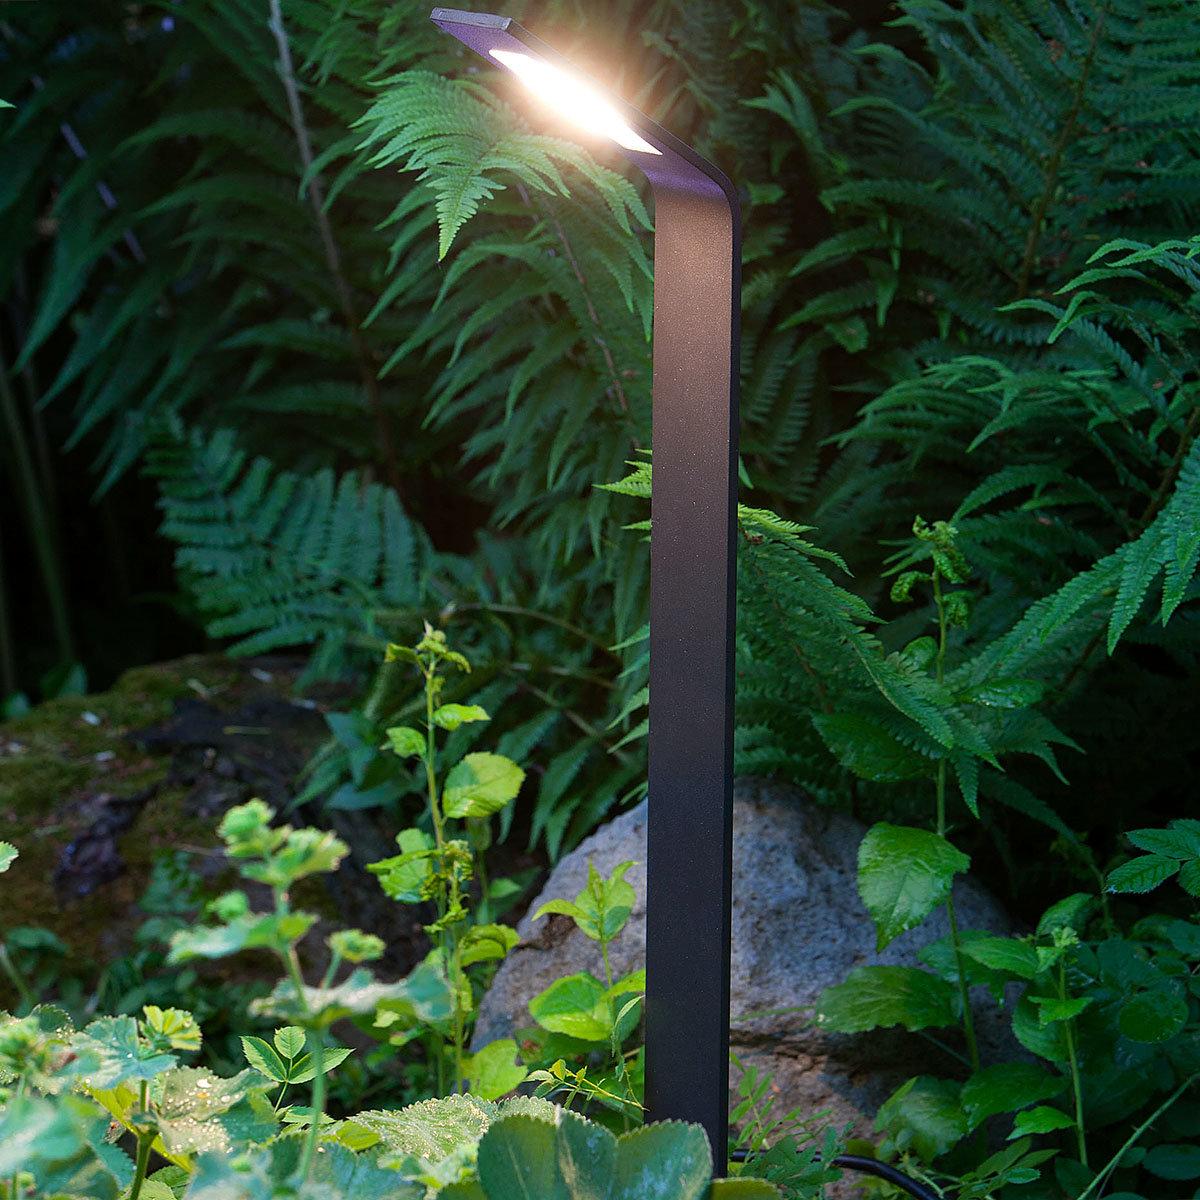 Smart Light Uferleuchte, 4 W, Metall, warmweiss,   #2